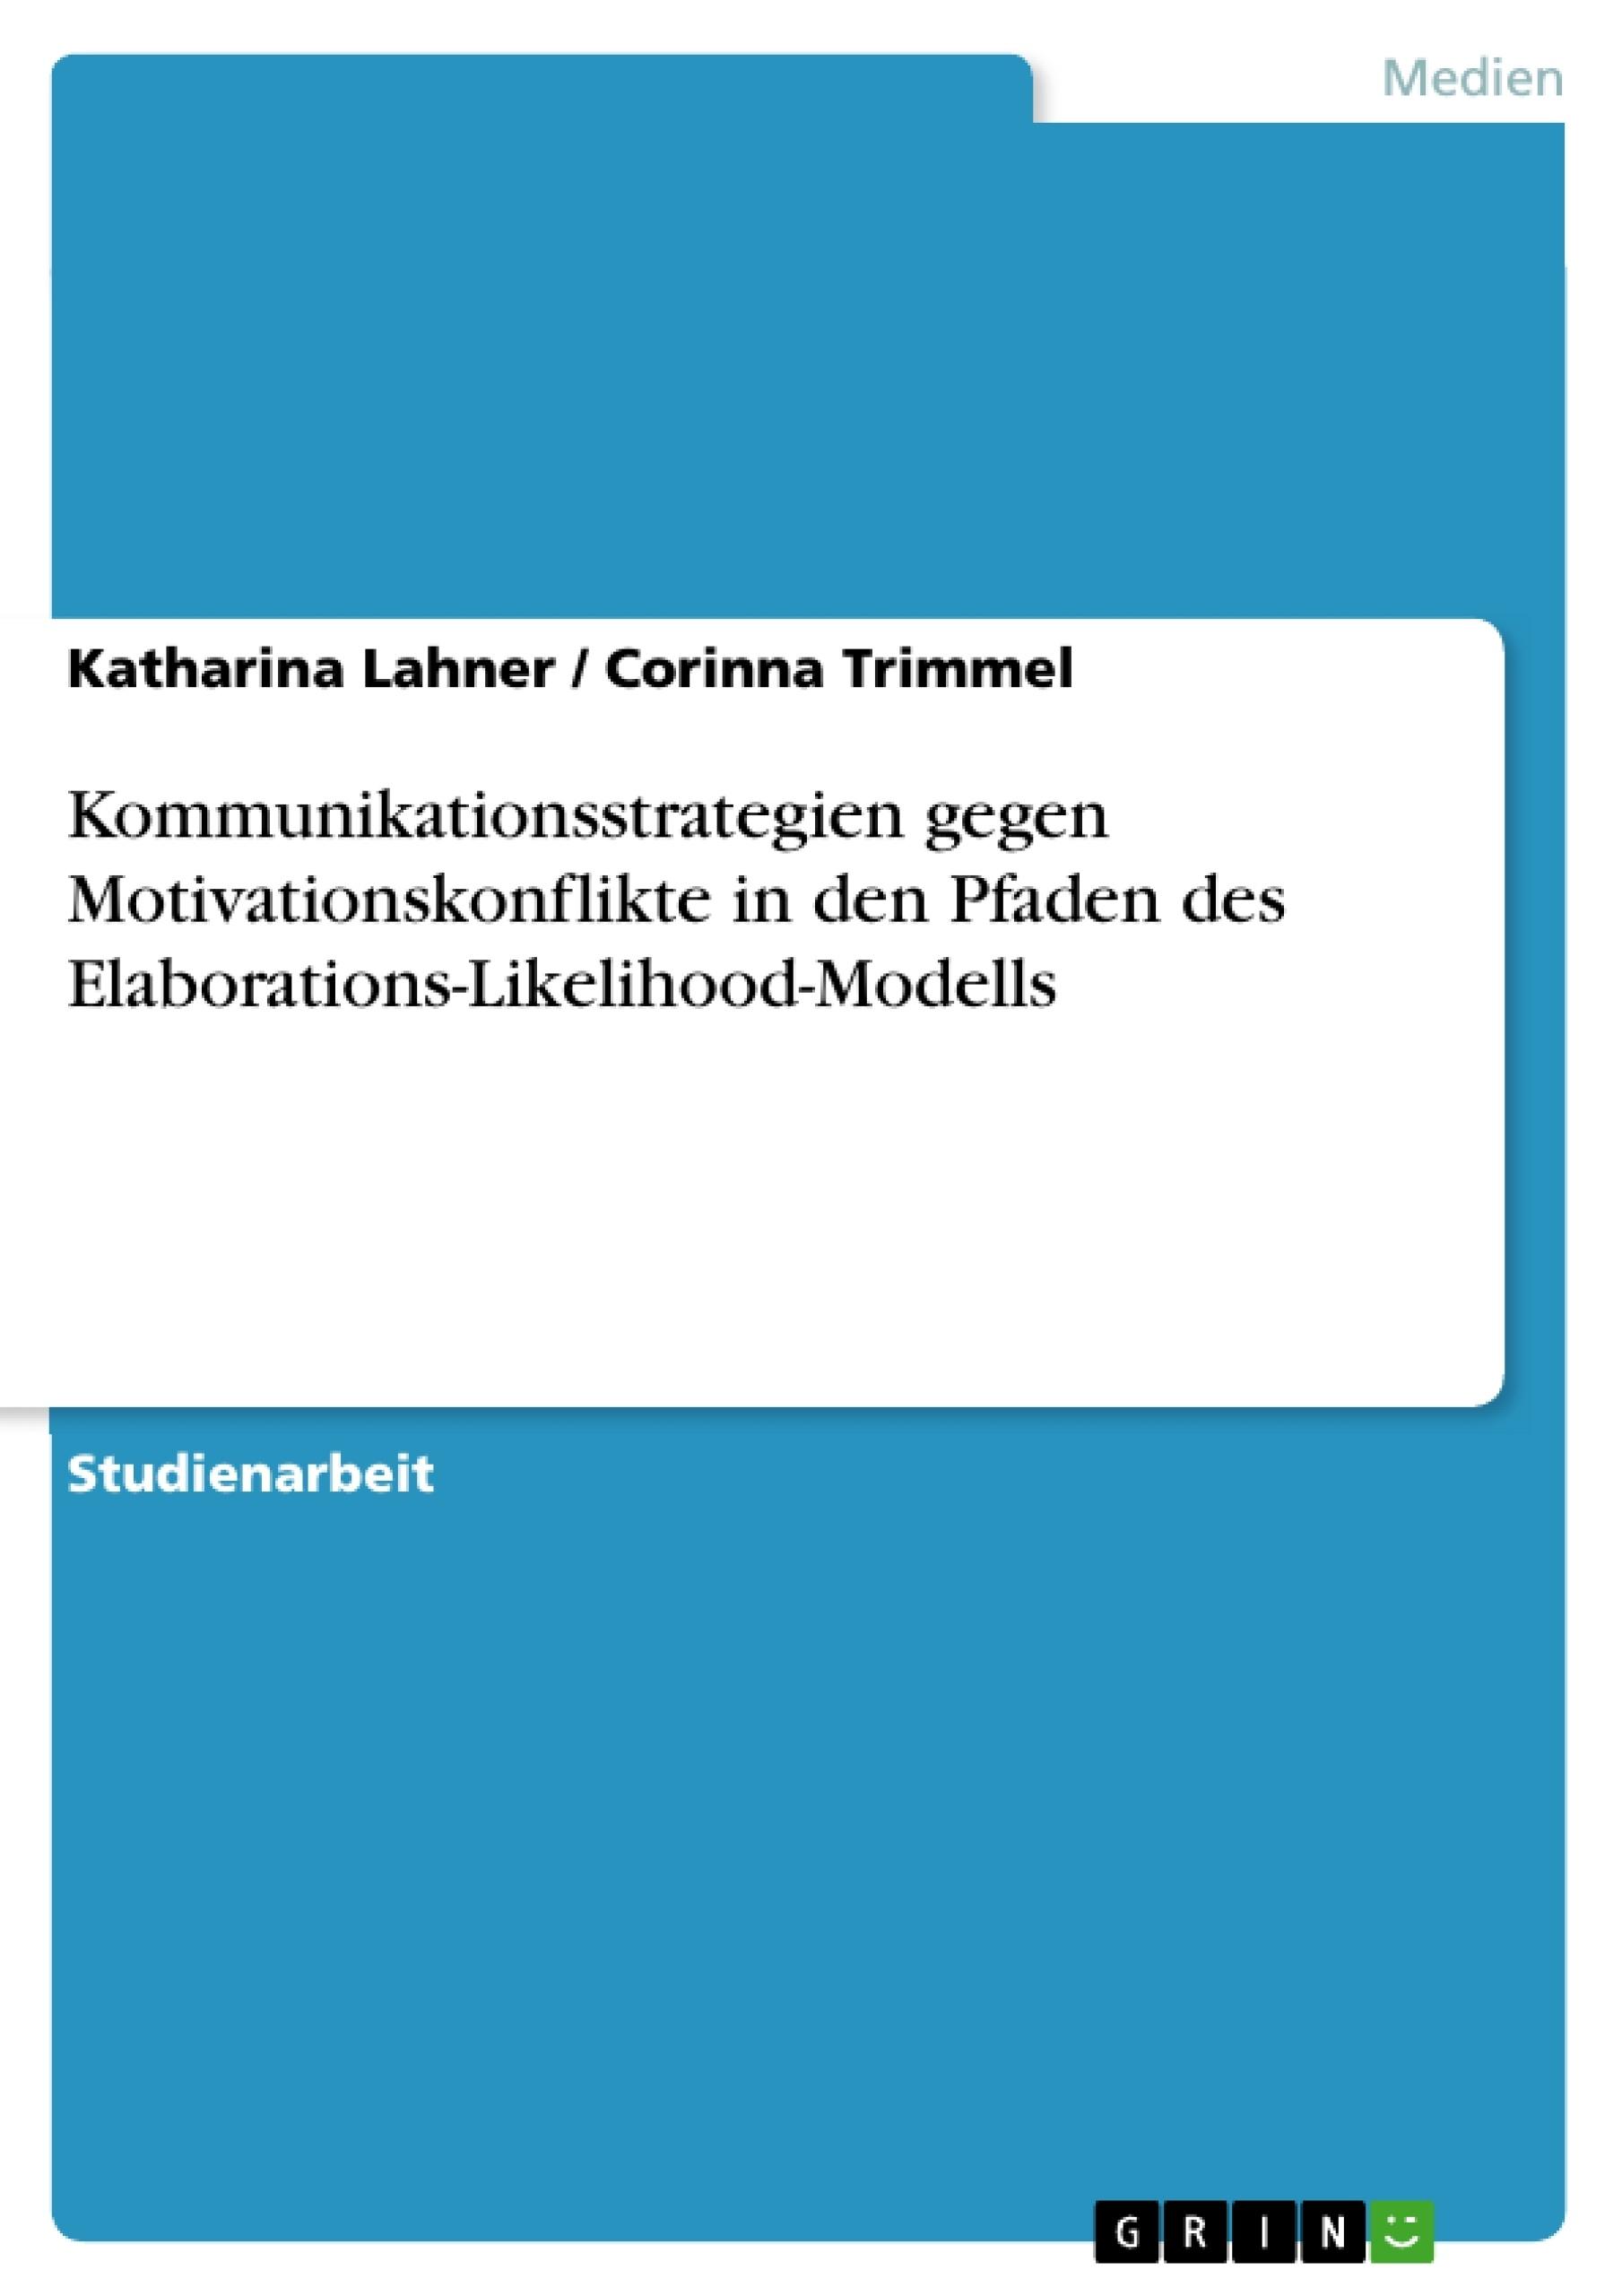 Titel: Kommunikationsstrategien gegen Motivationskonflikte in den Pfaden des Elaborations-Likelihood-Modells